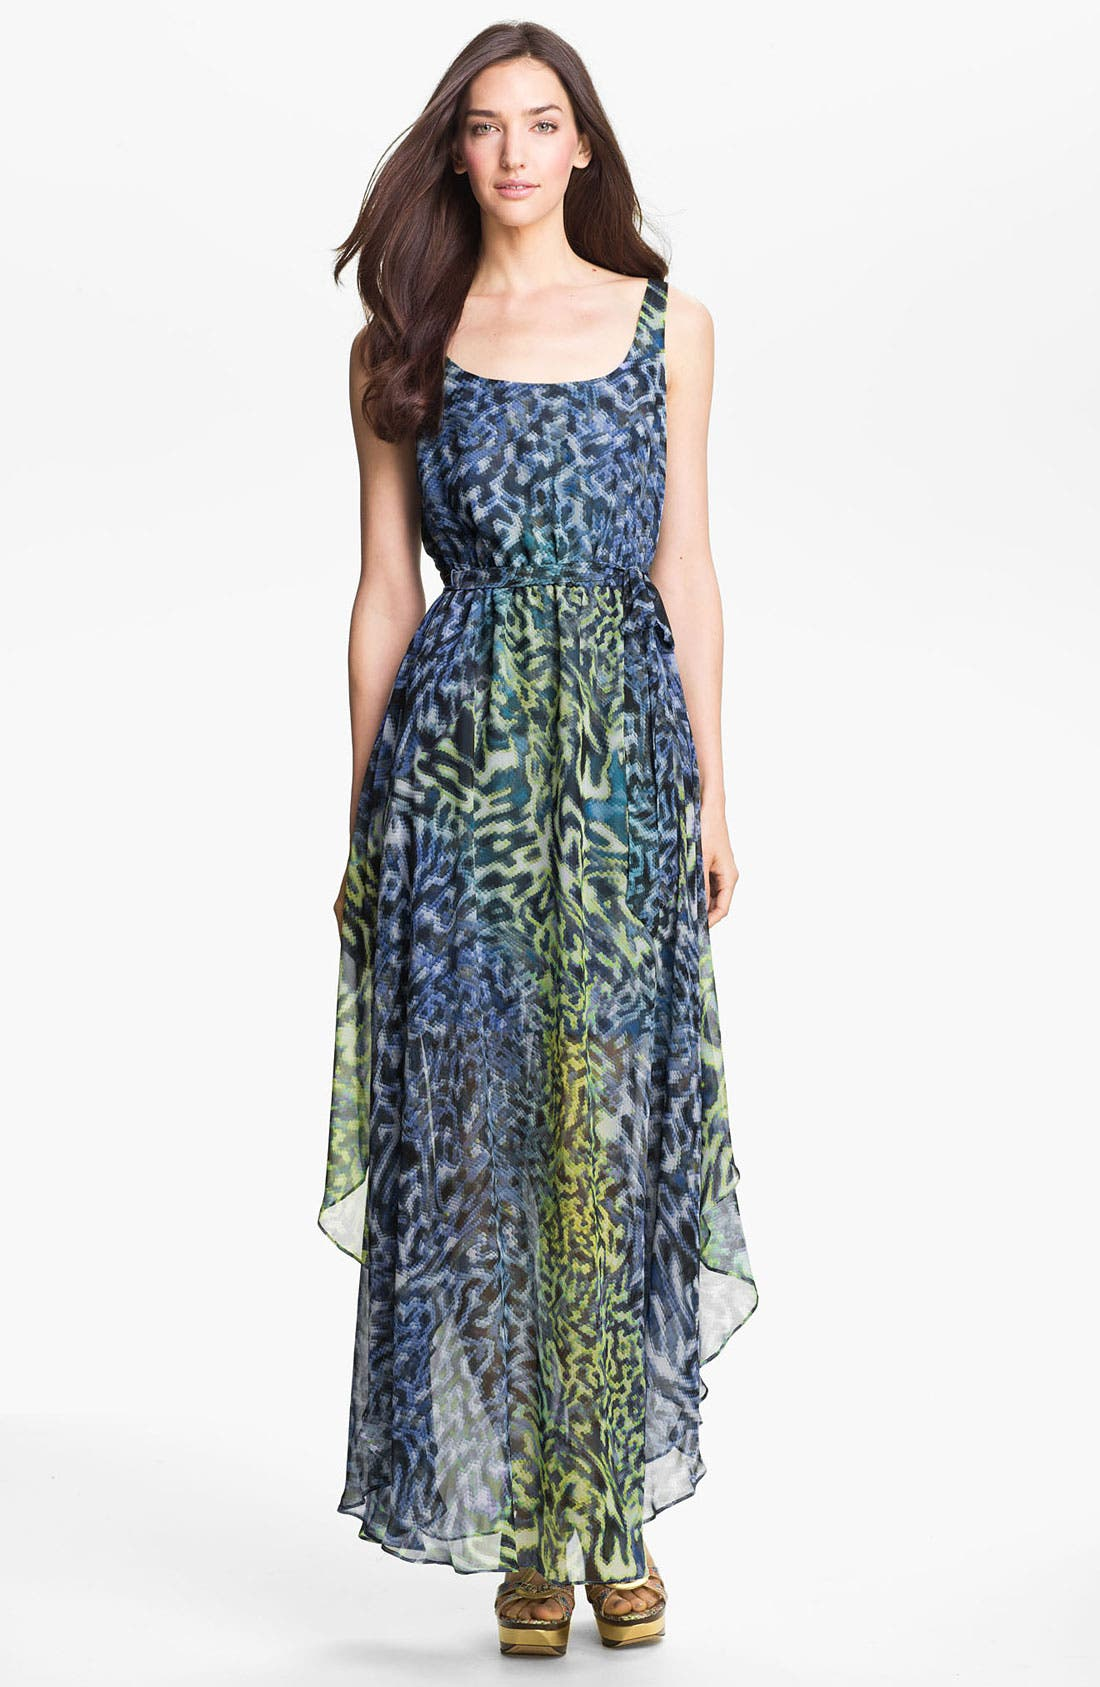 Main Image - Suzi Chin for Maggy Boutique Print Chiffon Maxi Dress